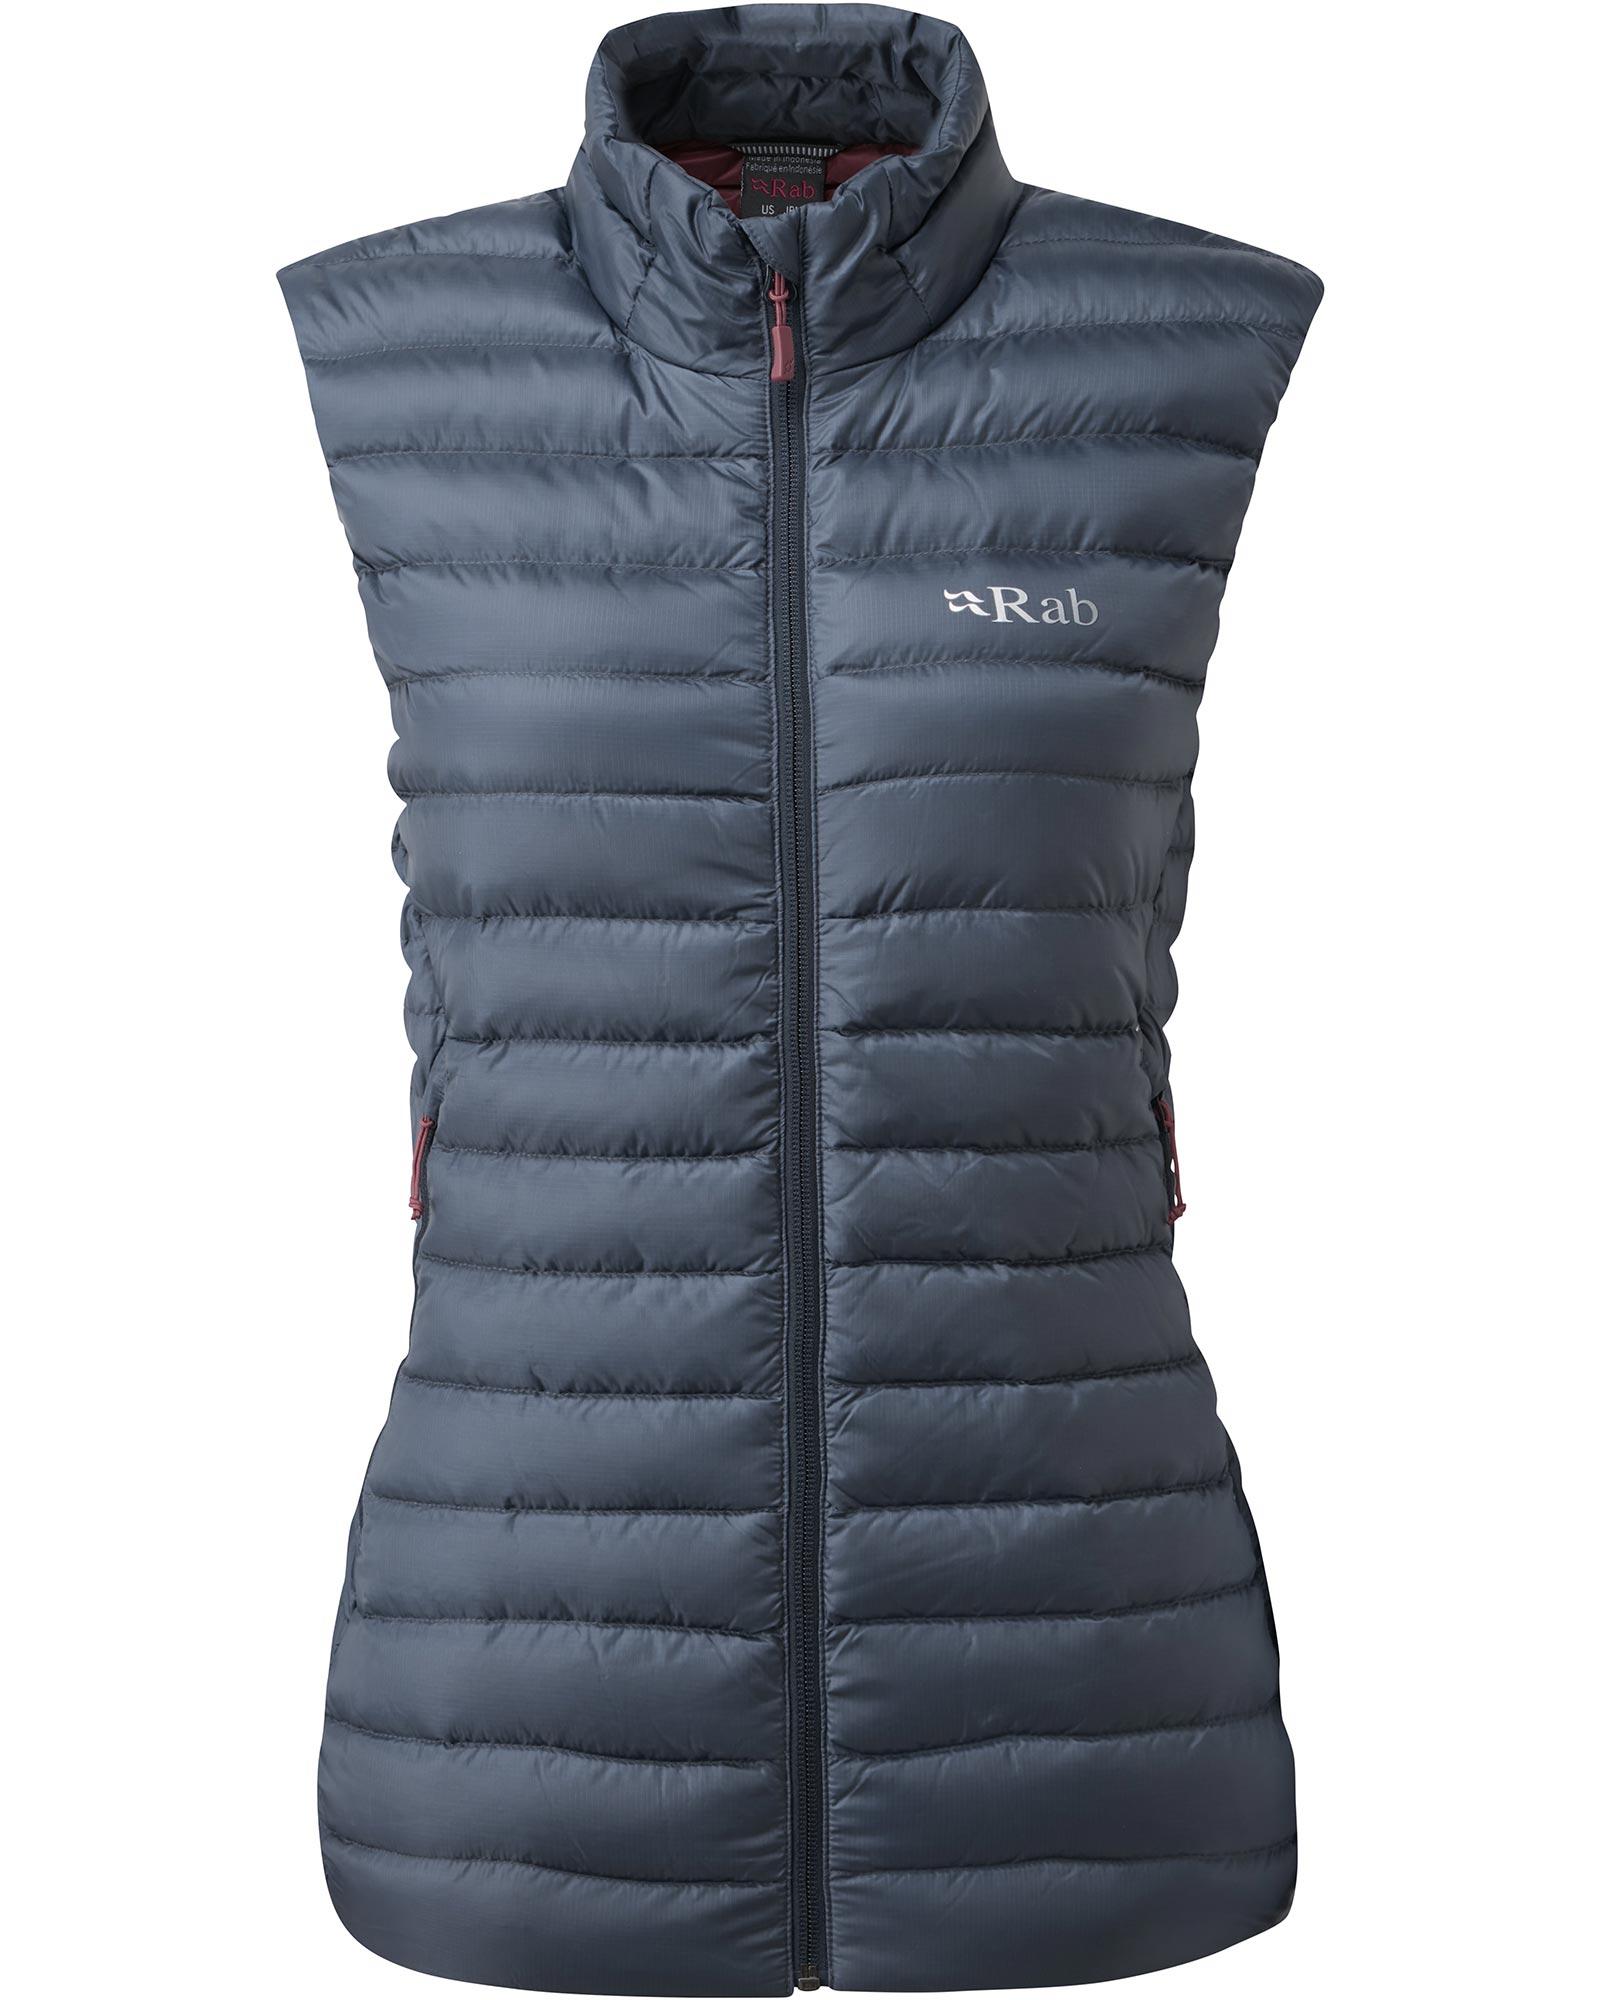 Rab Women's Microlight Vest 0